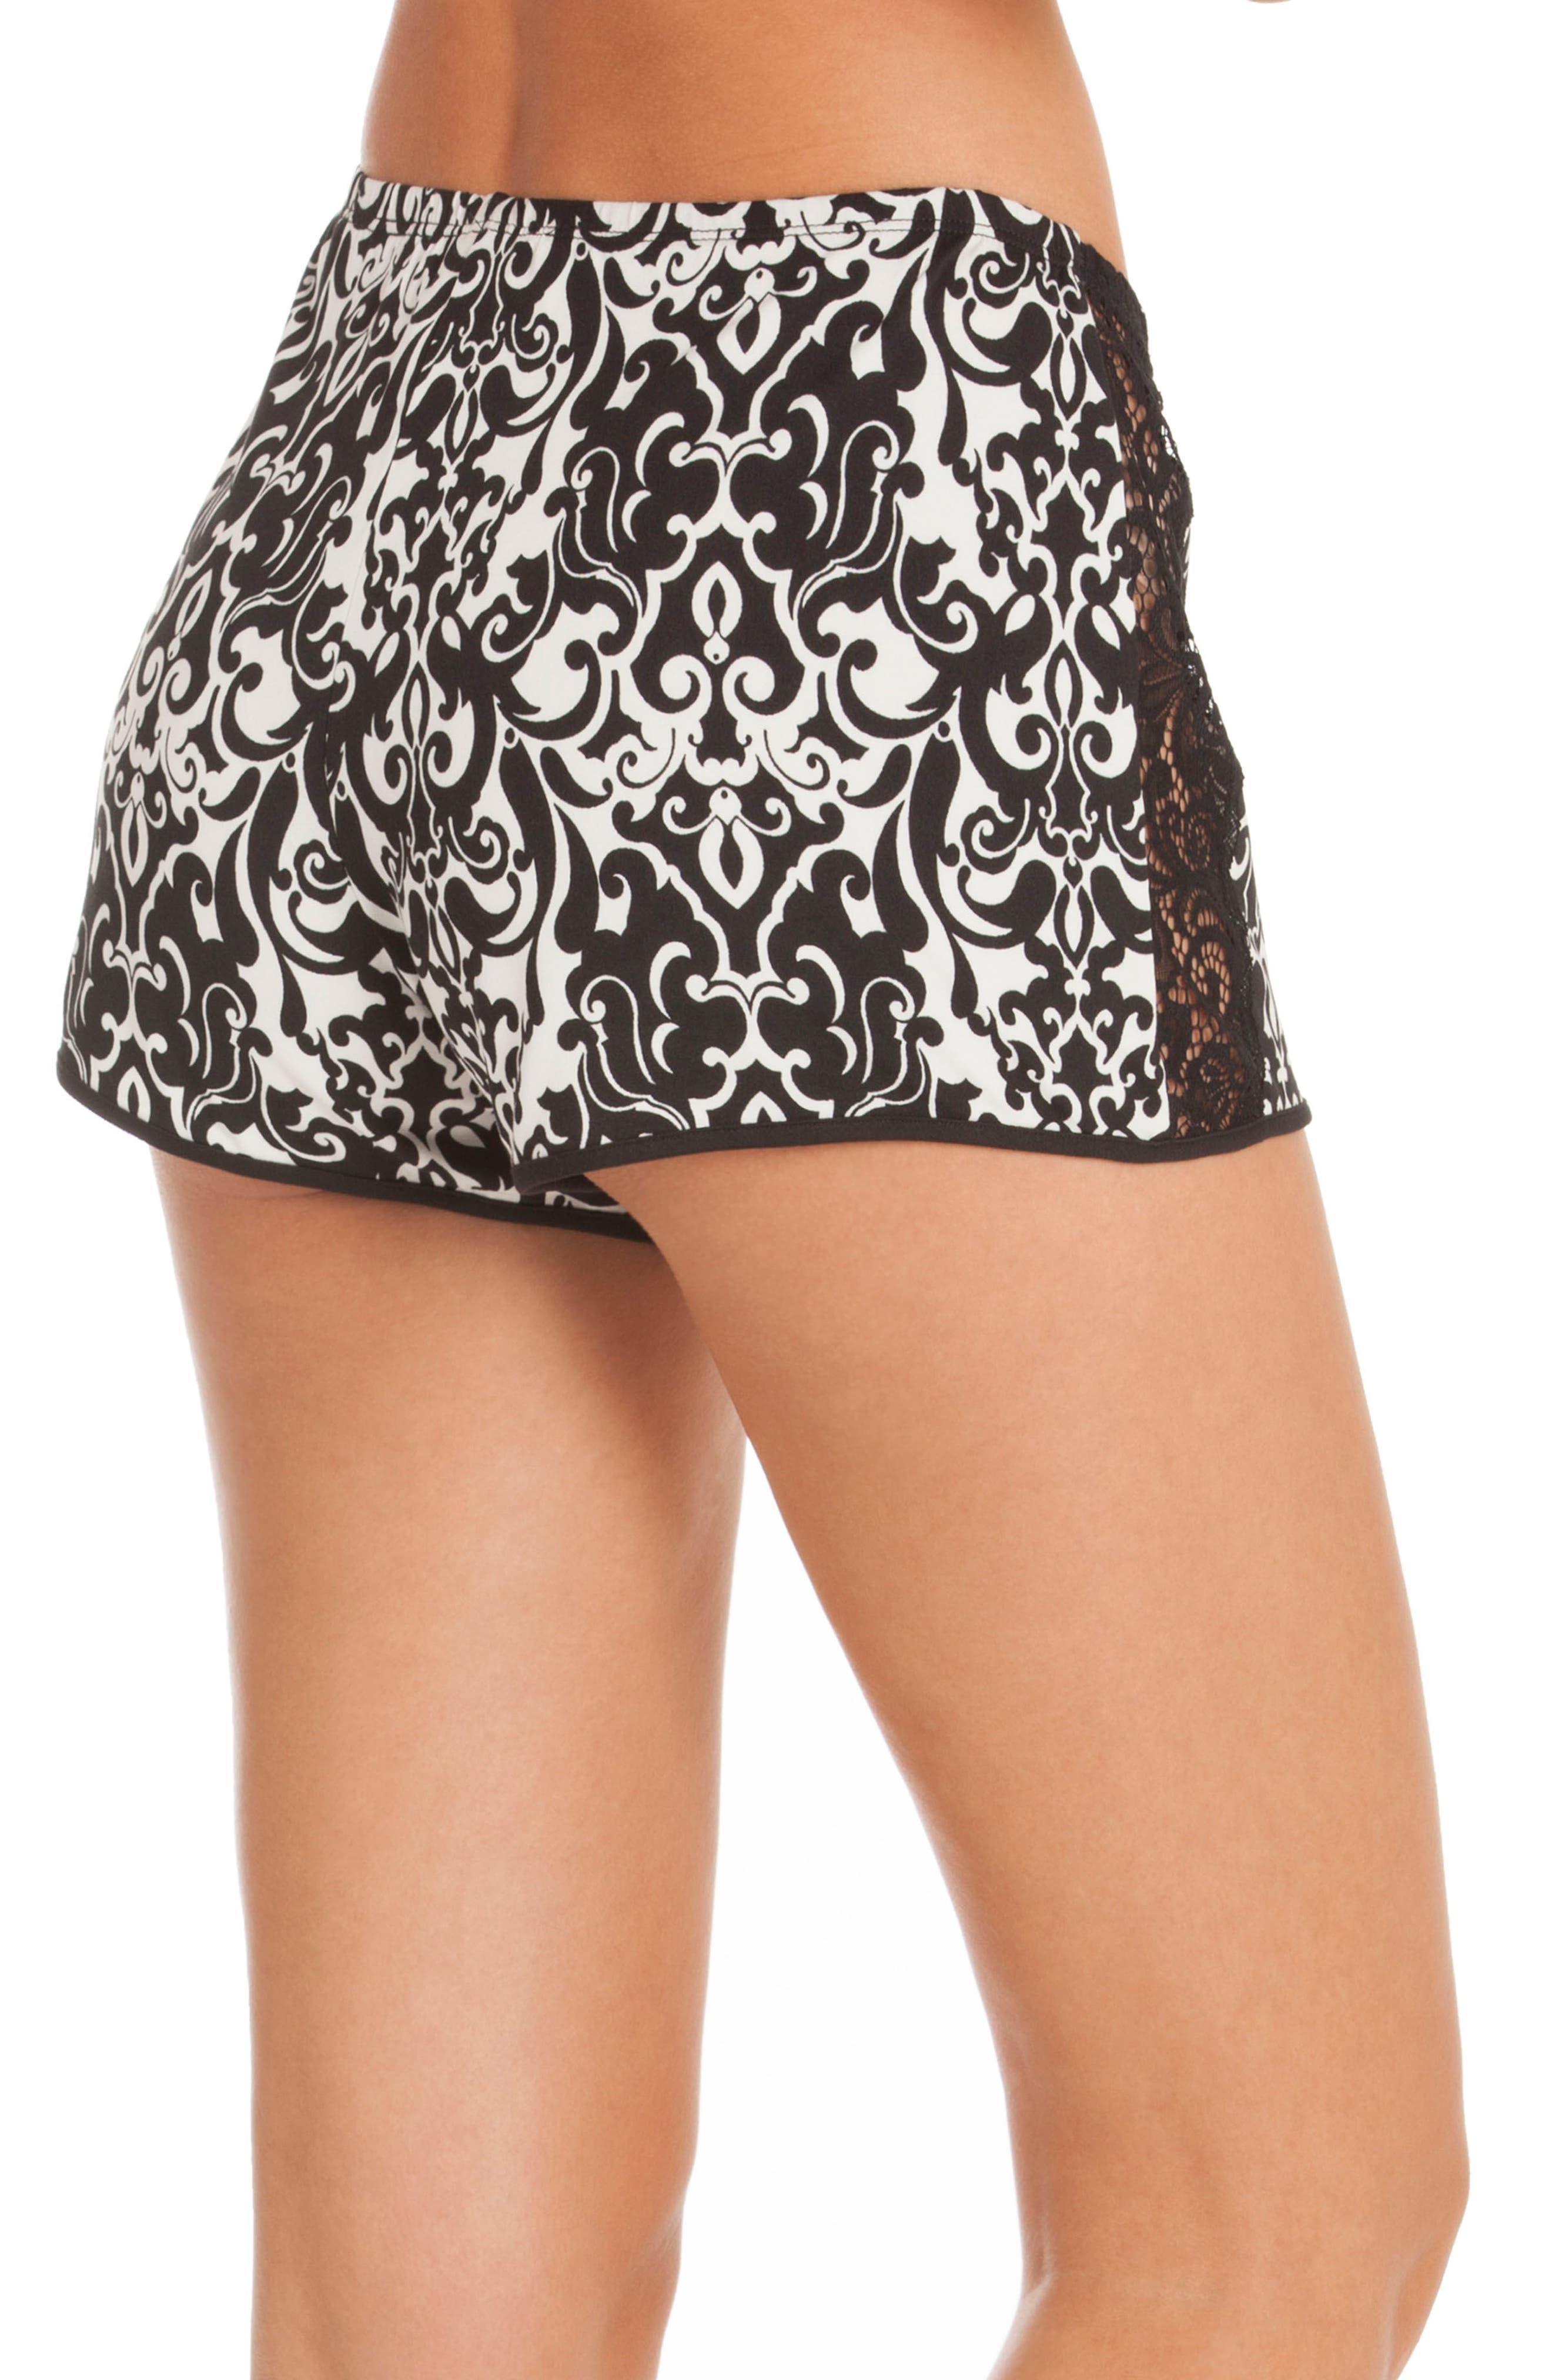 Konya Pajama Shorts,                             Alternate thumbnail 3, color,                             001